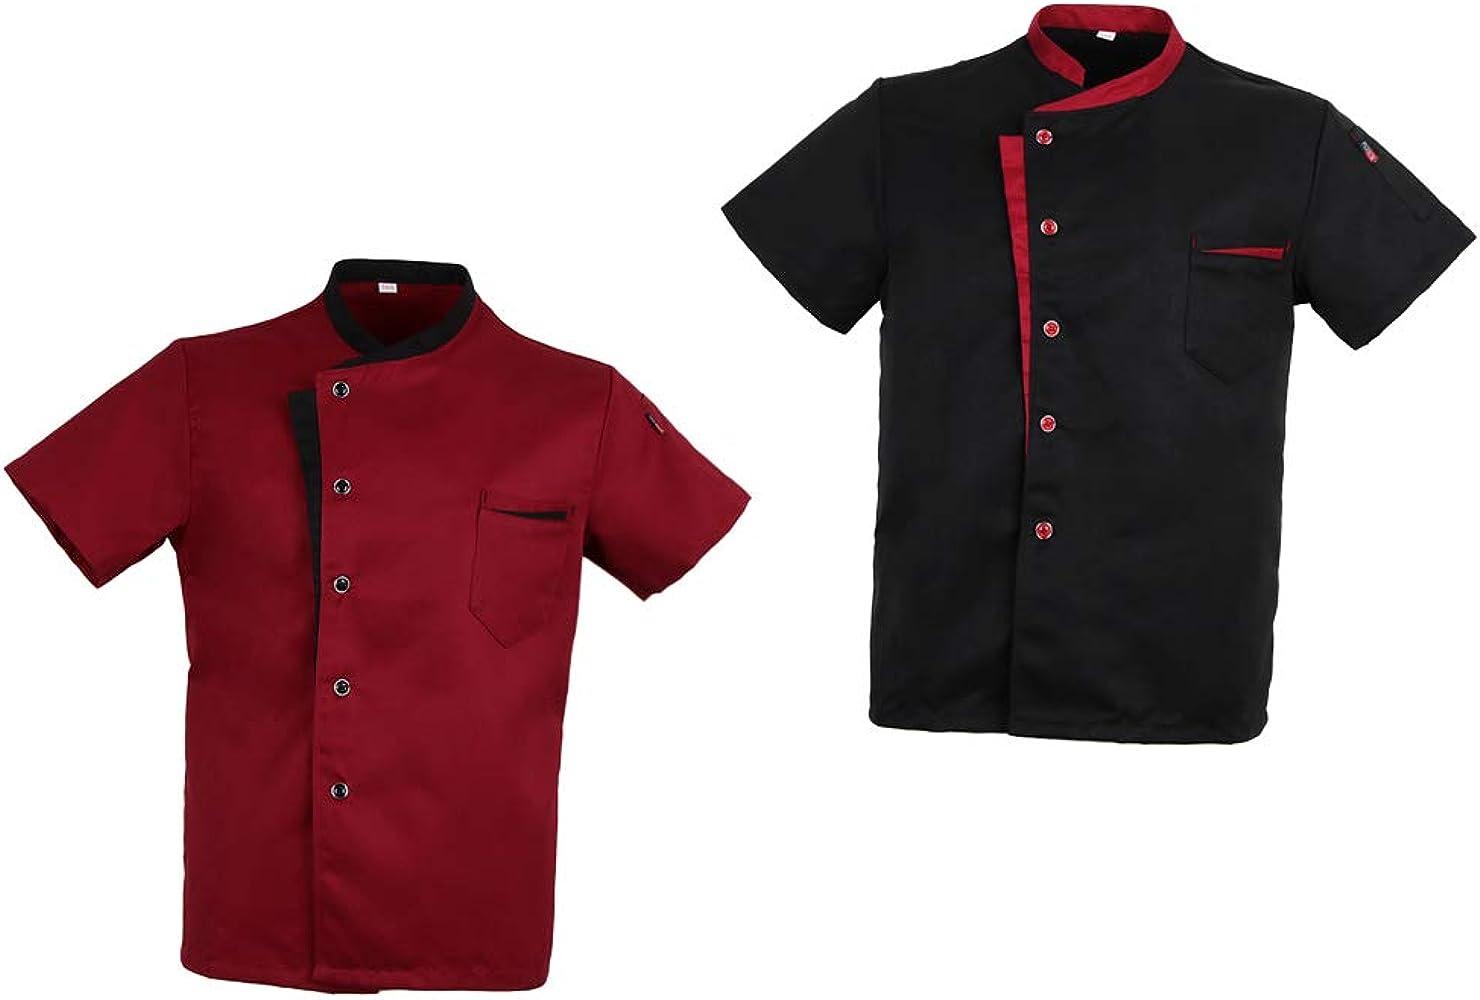 Baoblaze 2x Chaqueta de Chef Ejecutivo Moda Clásica Formal Ropa de ...